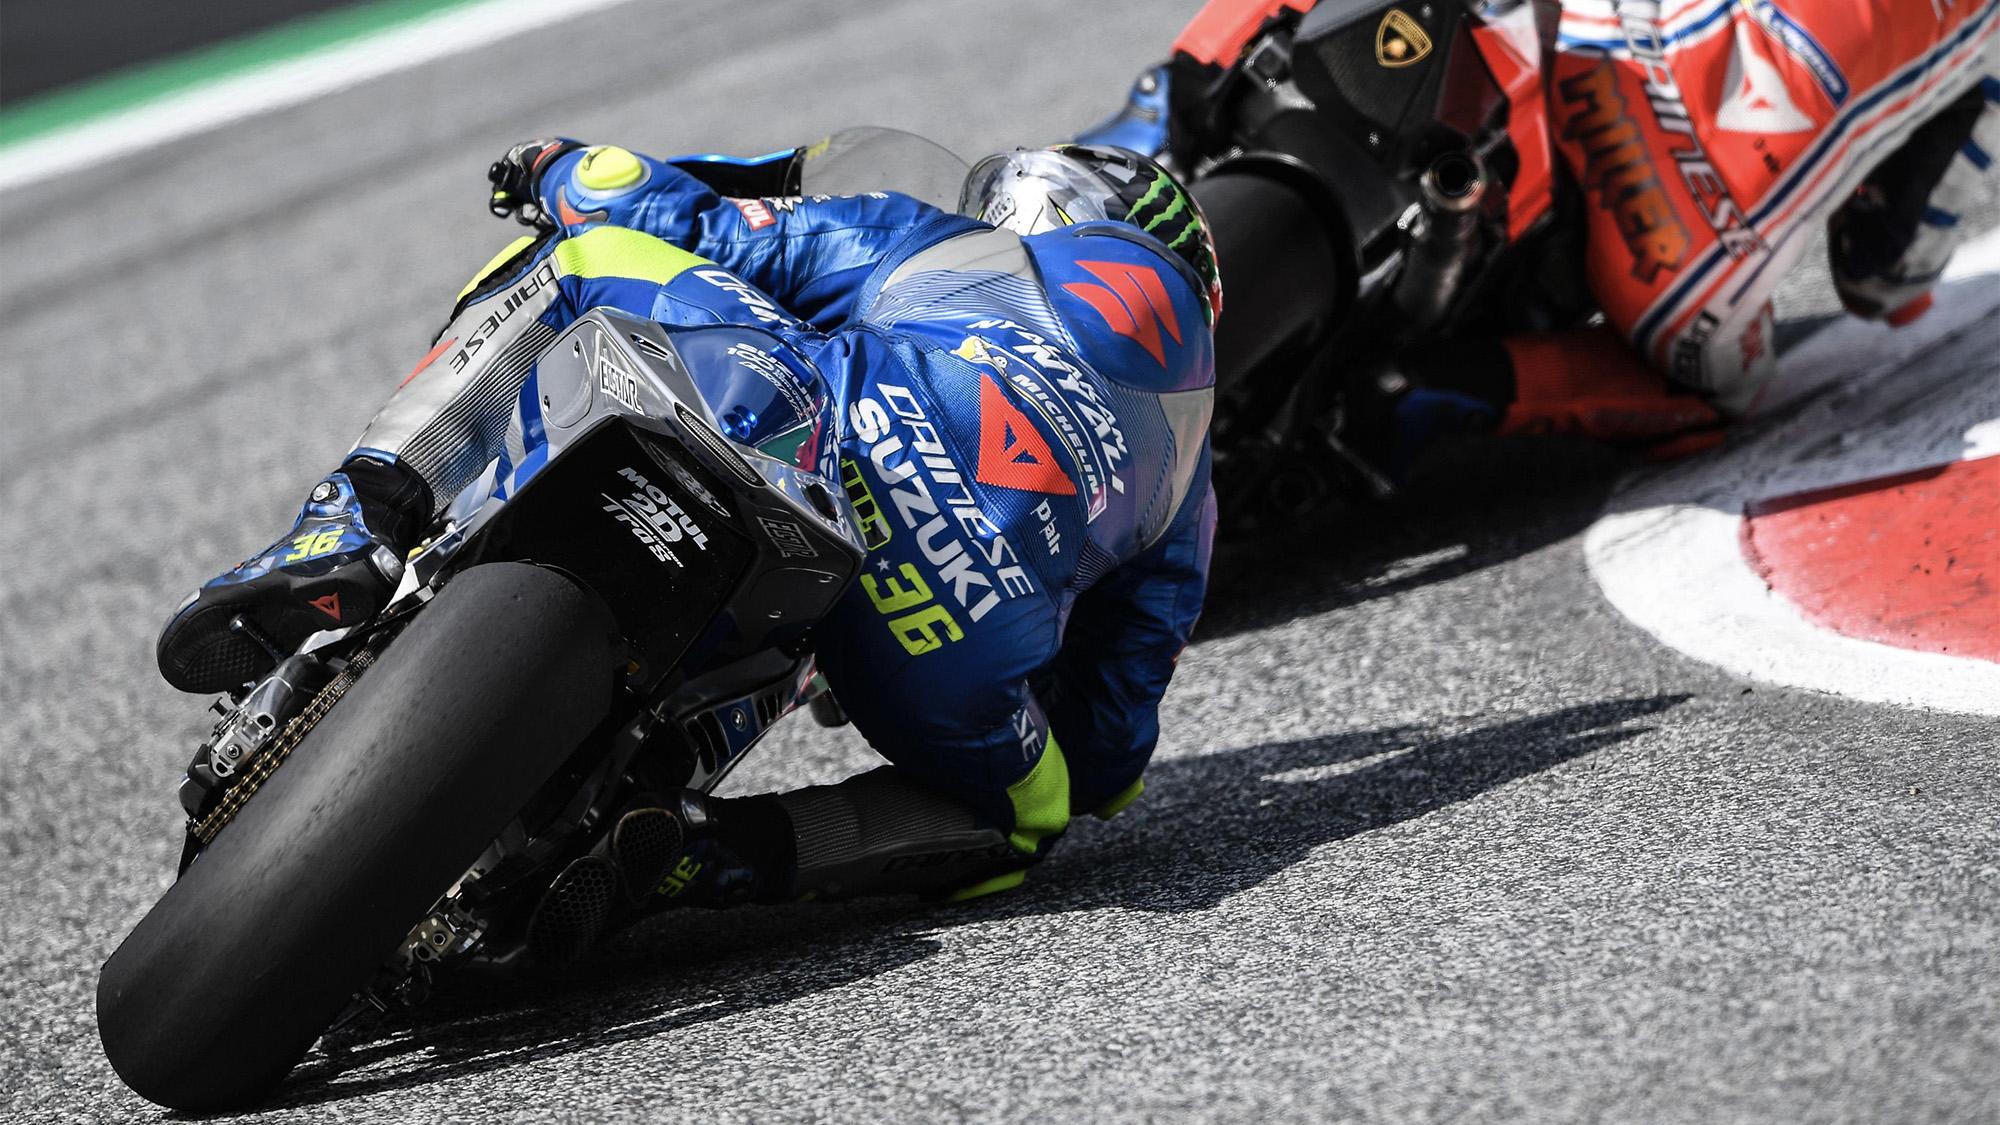 Joan Mir cornering during the 2020 MotoGP Austrian Grand Prix